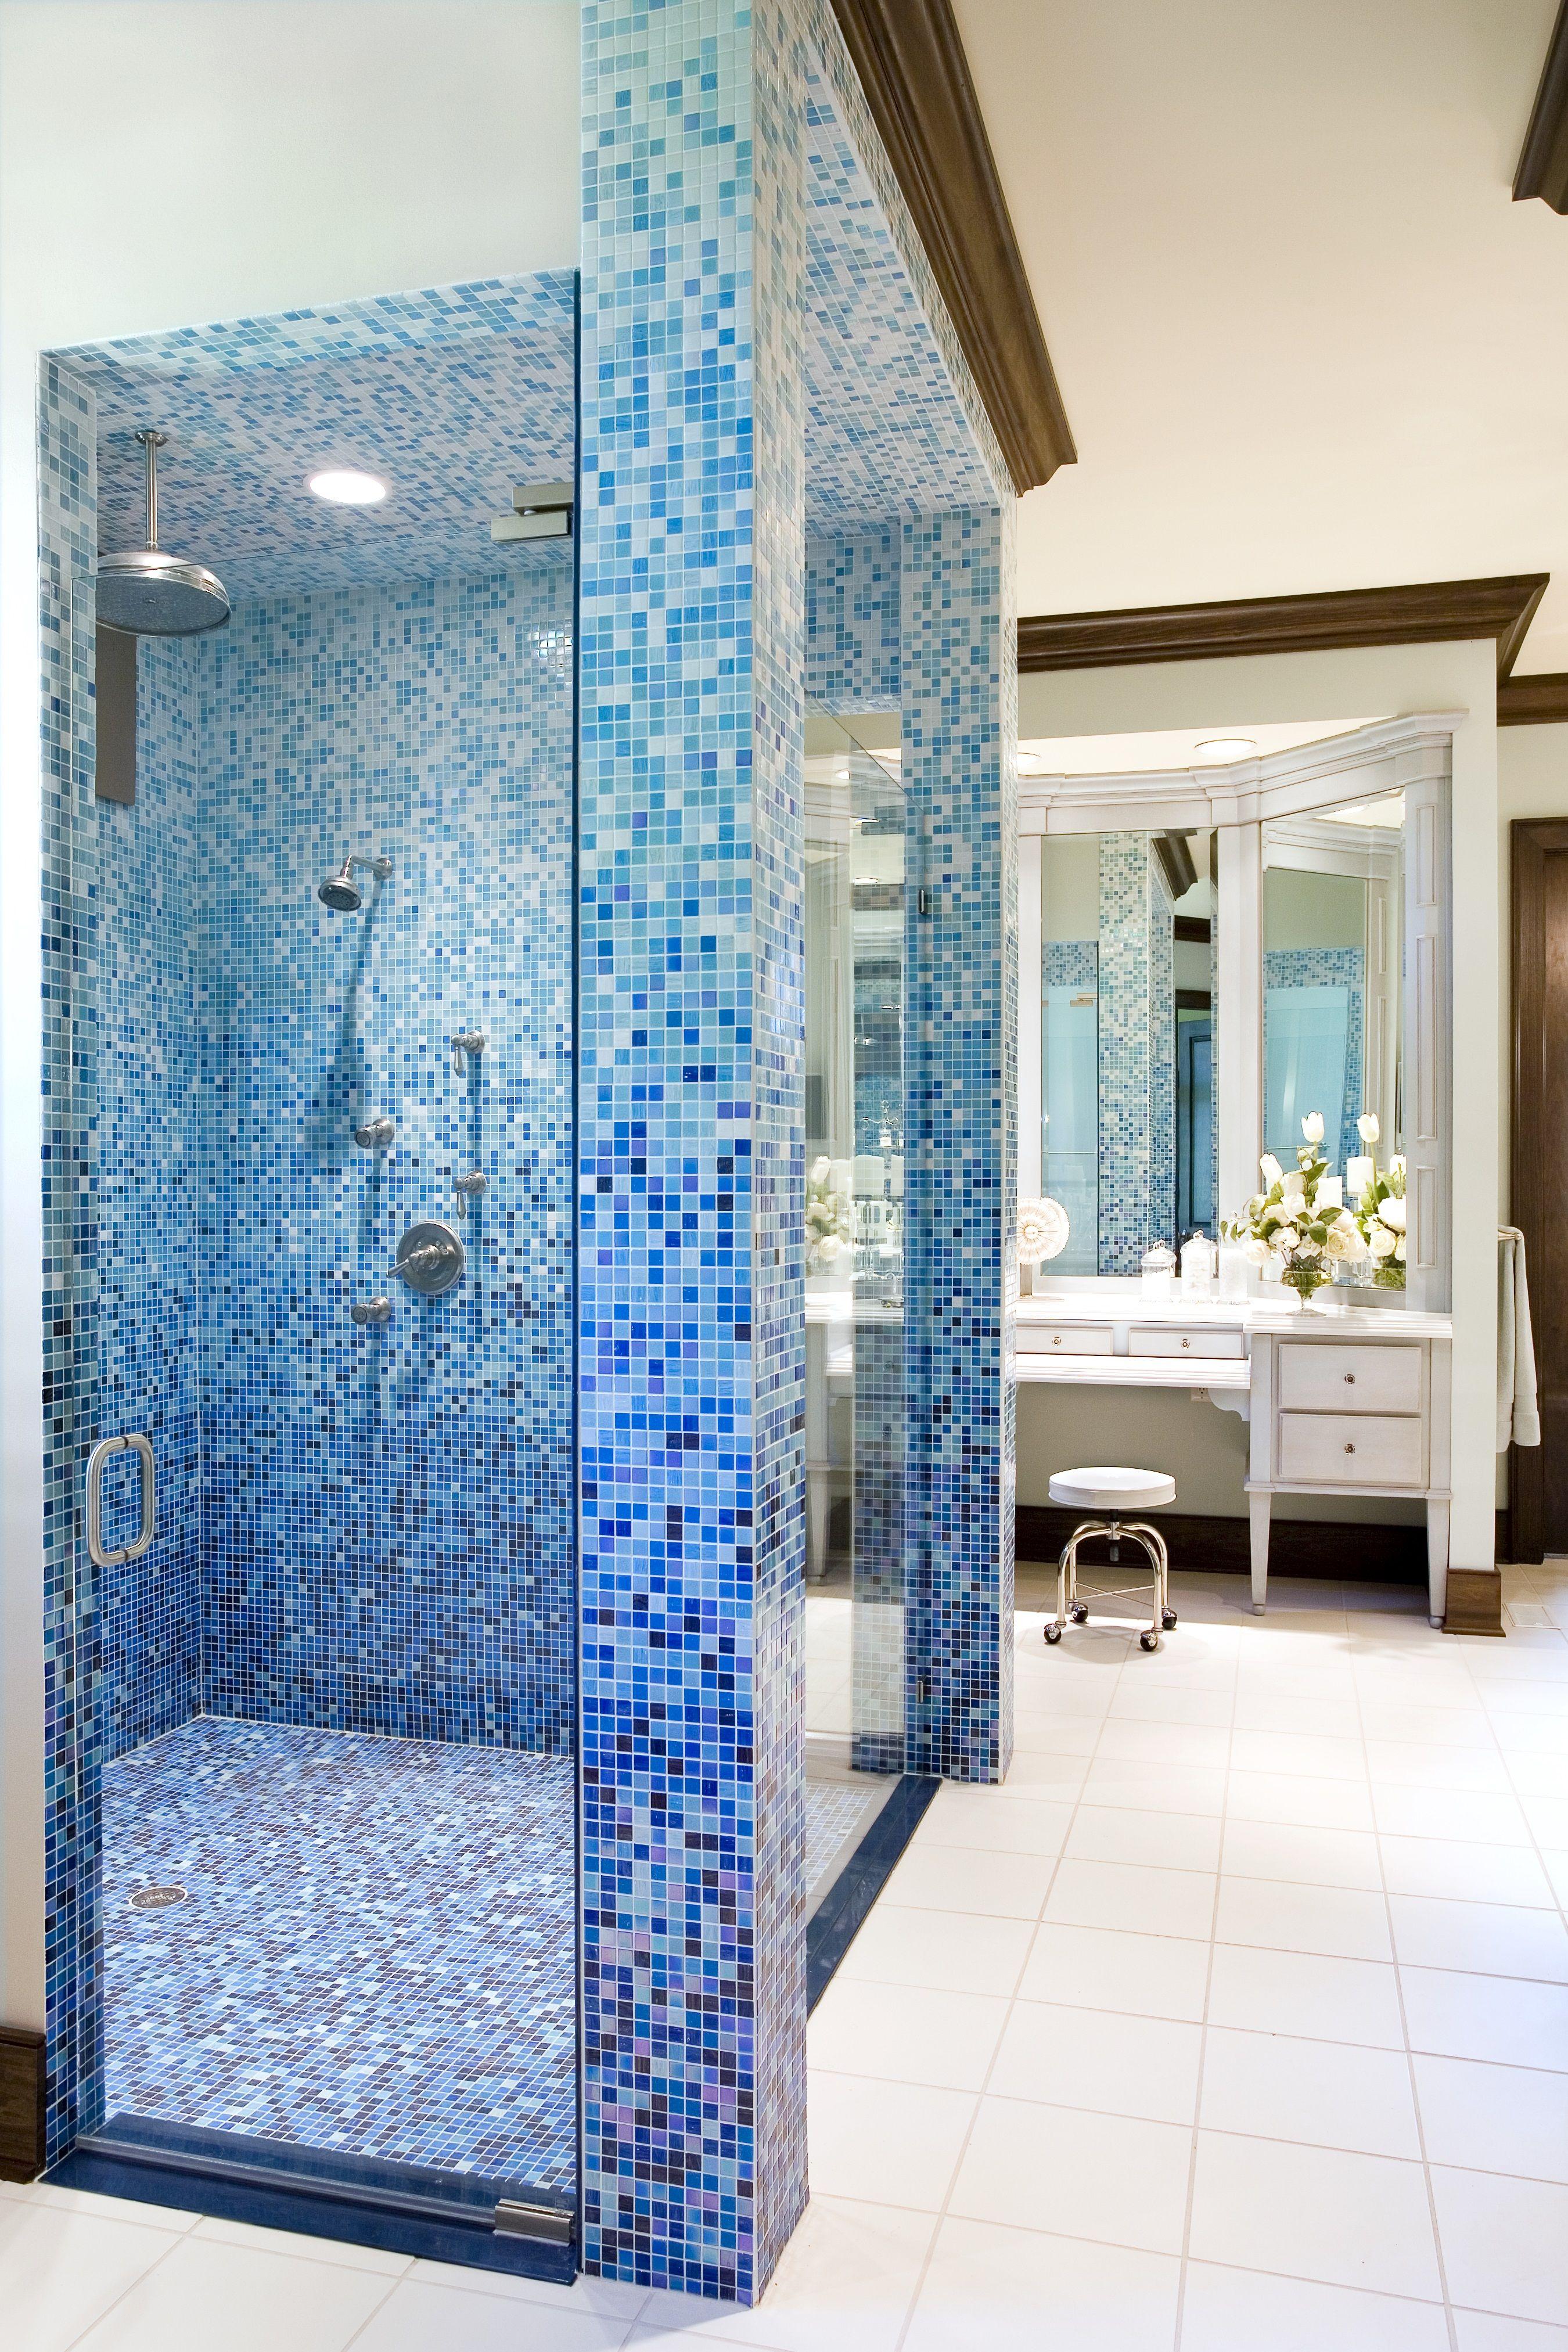 Bathroom, creative tile pattern - Designers: Kristin Okeley, ASID ...